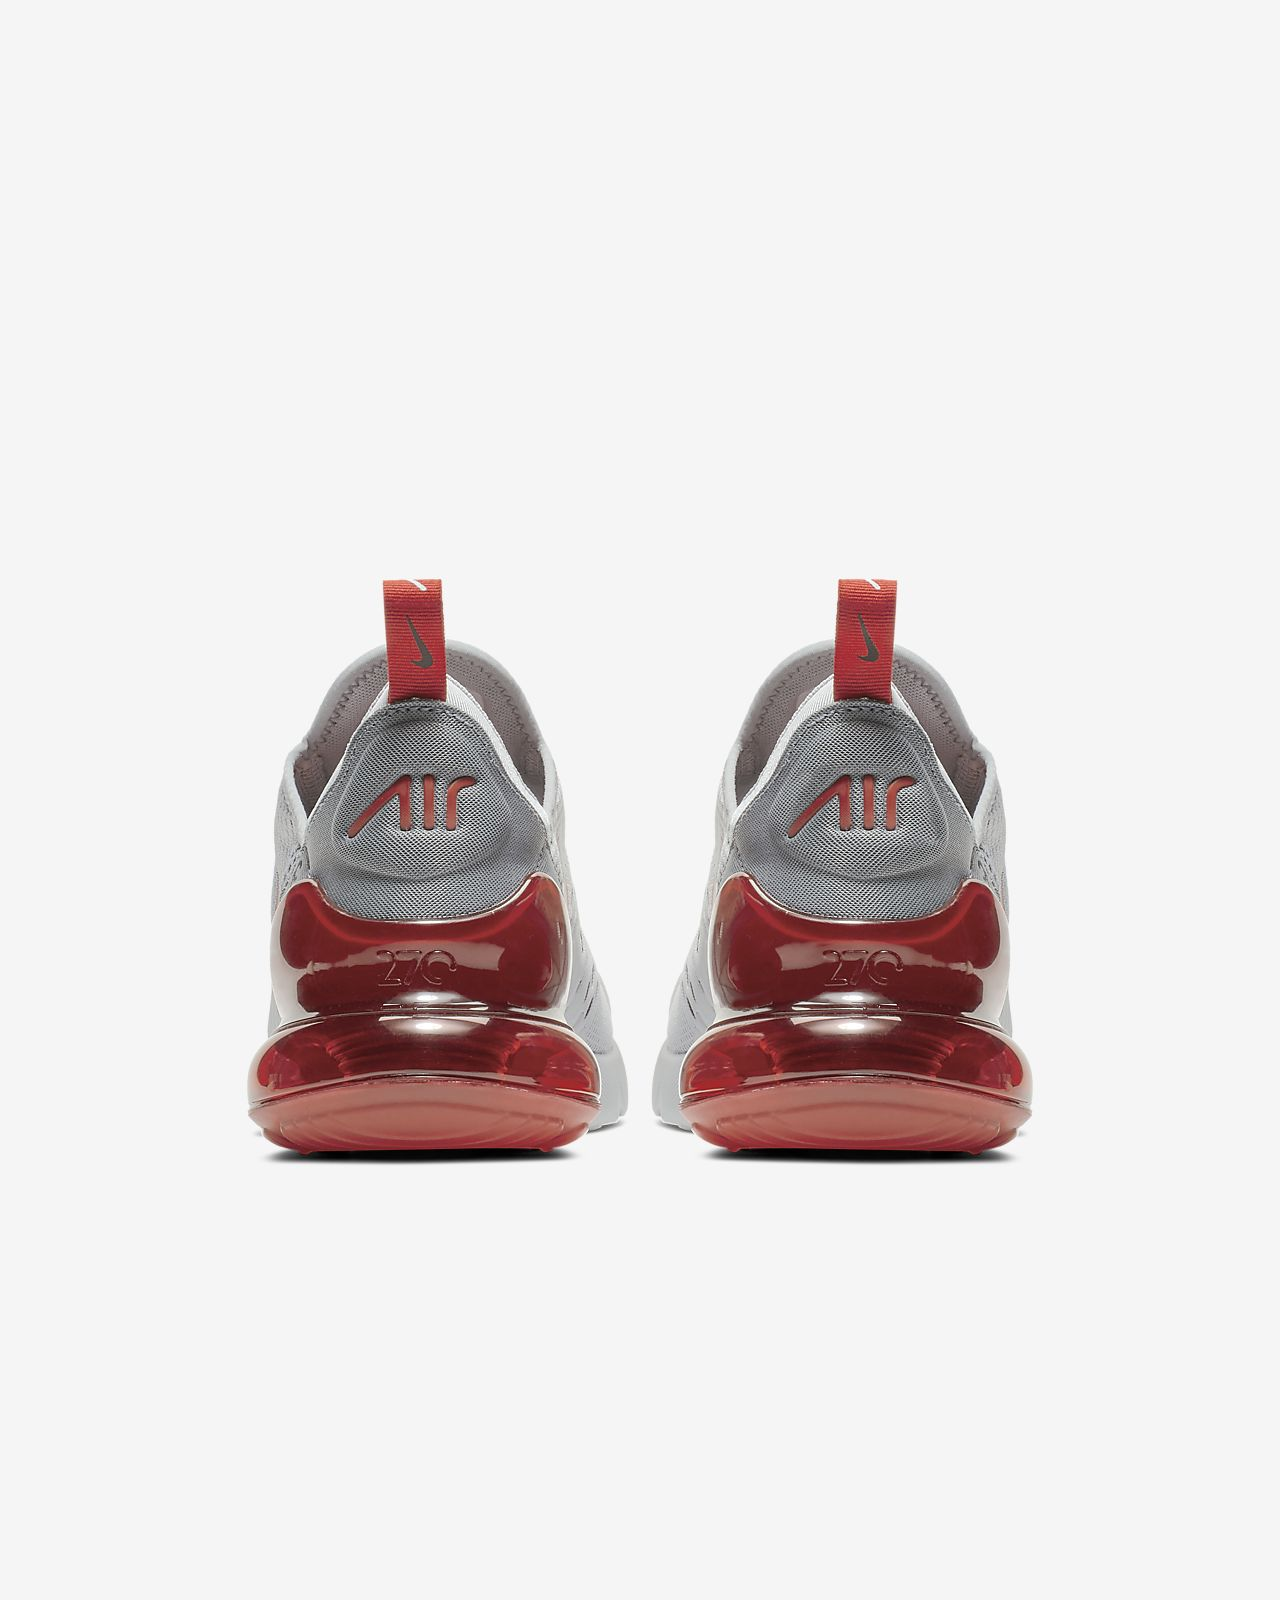 b8d5e5ee38 Chaussure Nike Air Max 270 pour Homme. Nike.com FR